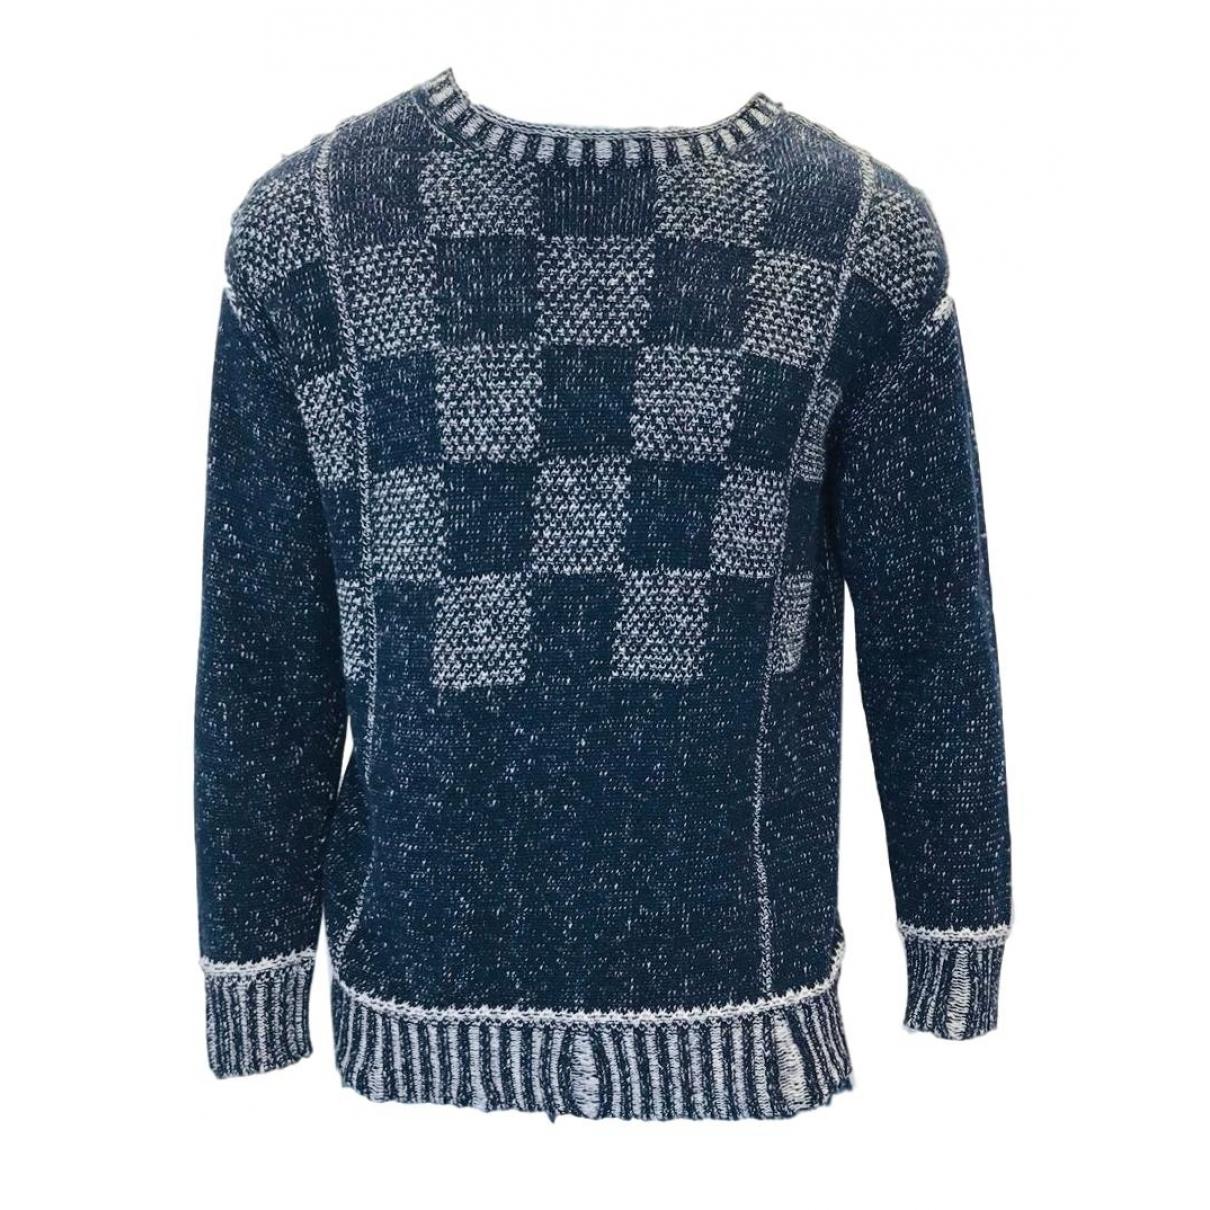 Junya Watanabe \N Blue Cotton Knitwear & Sweatshirts for Men S International